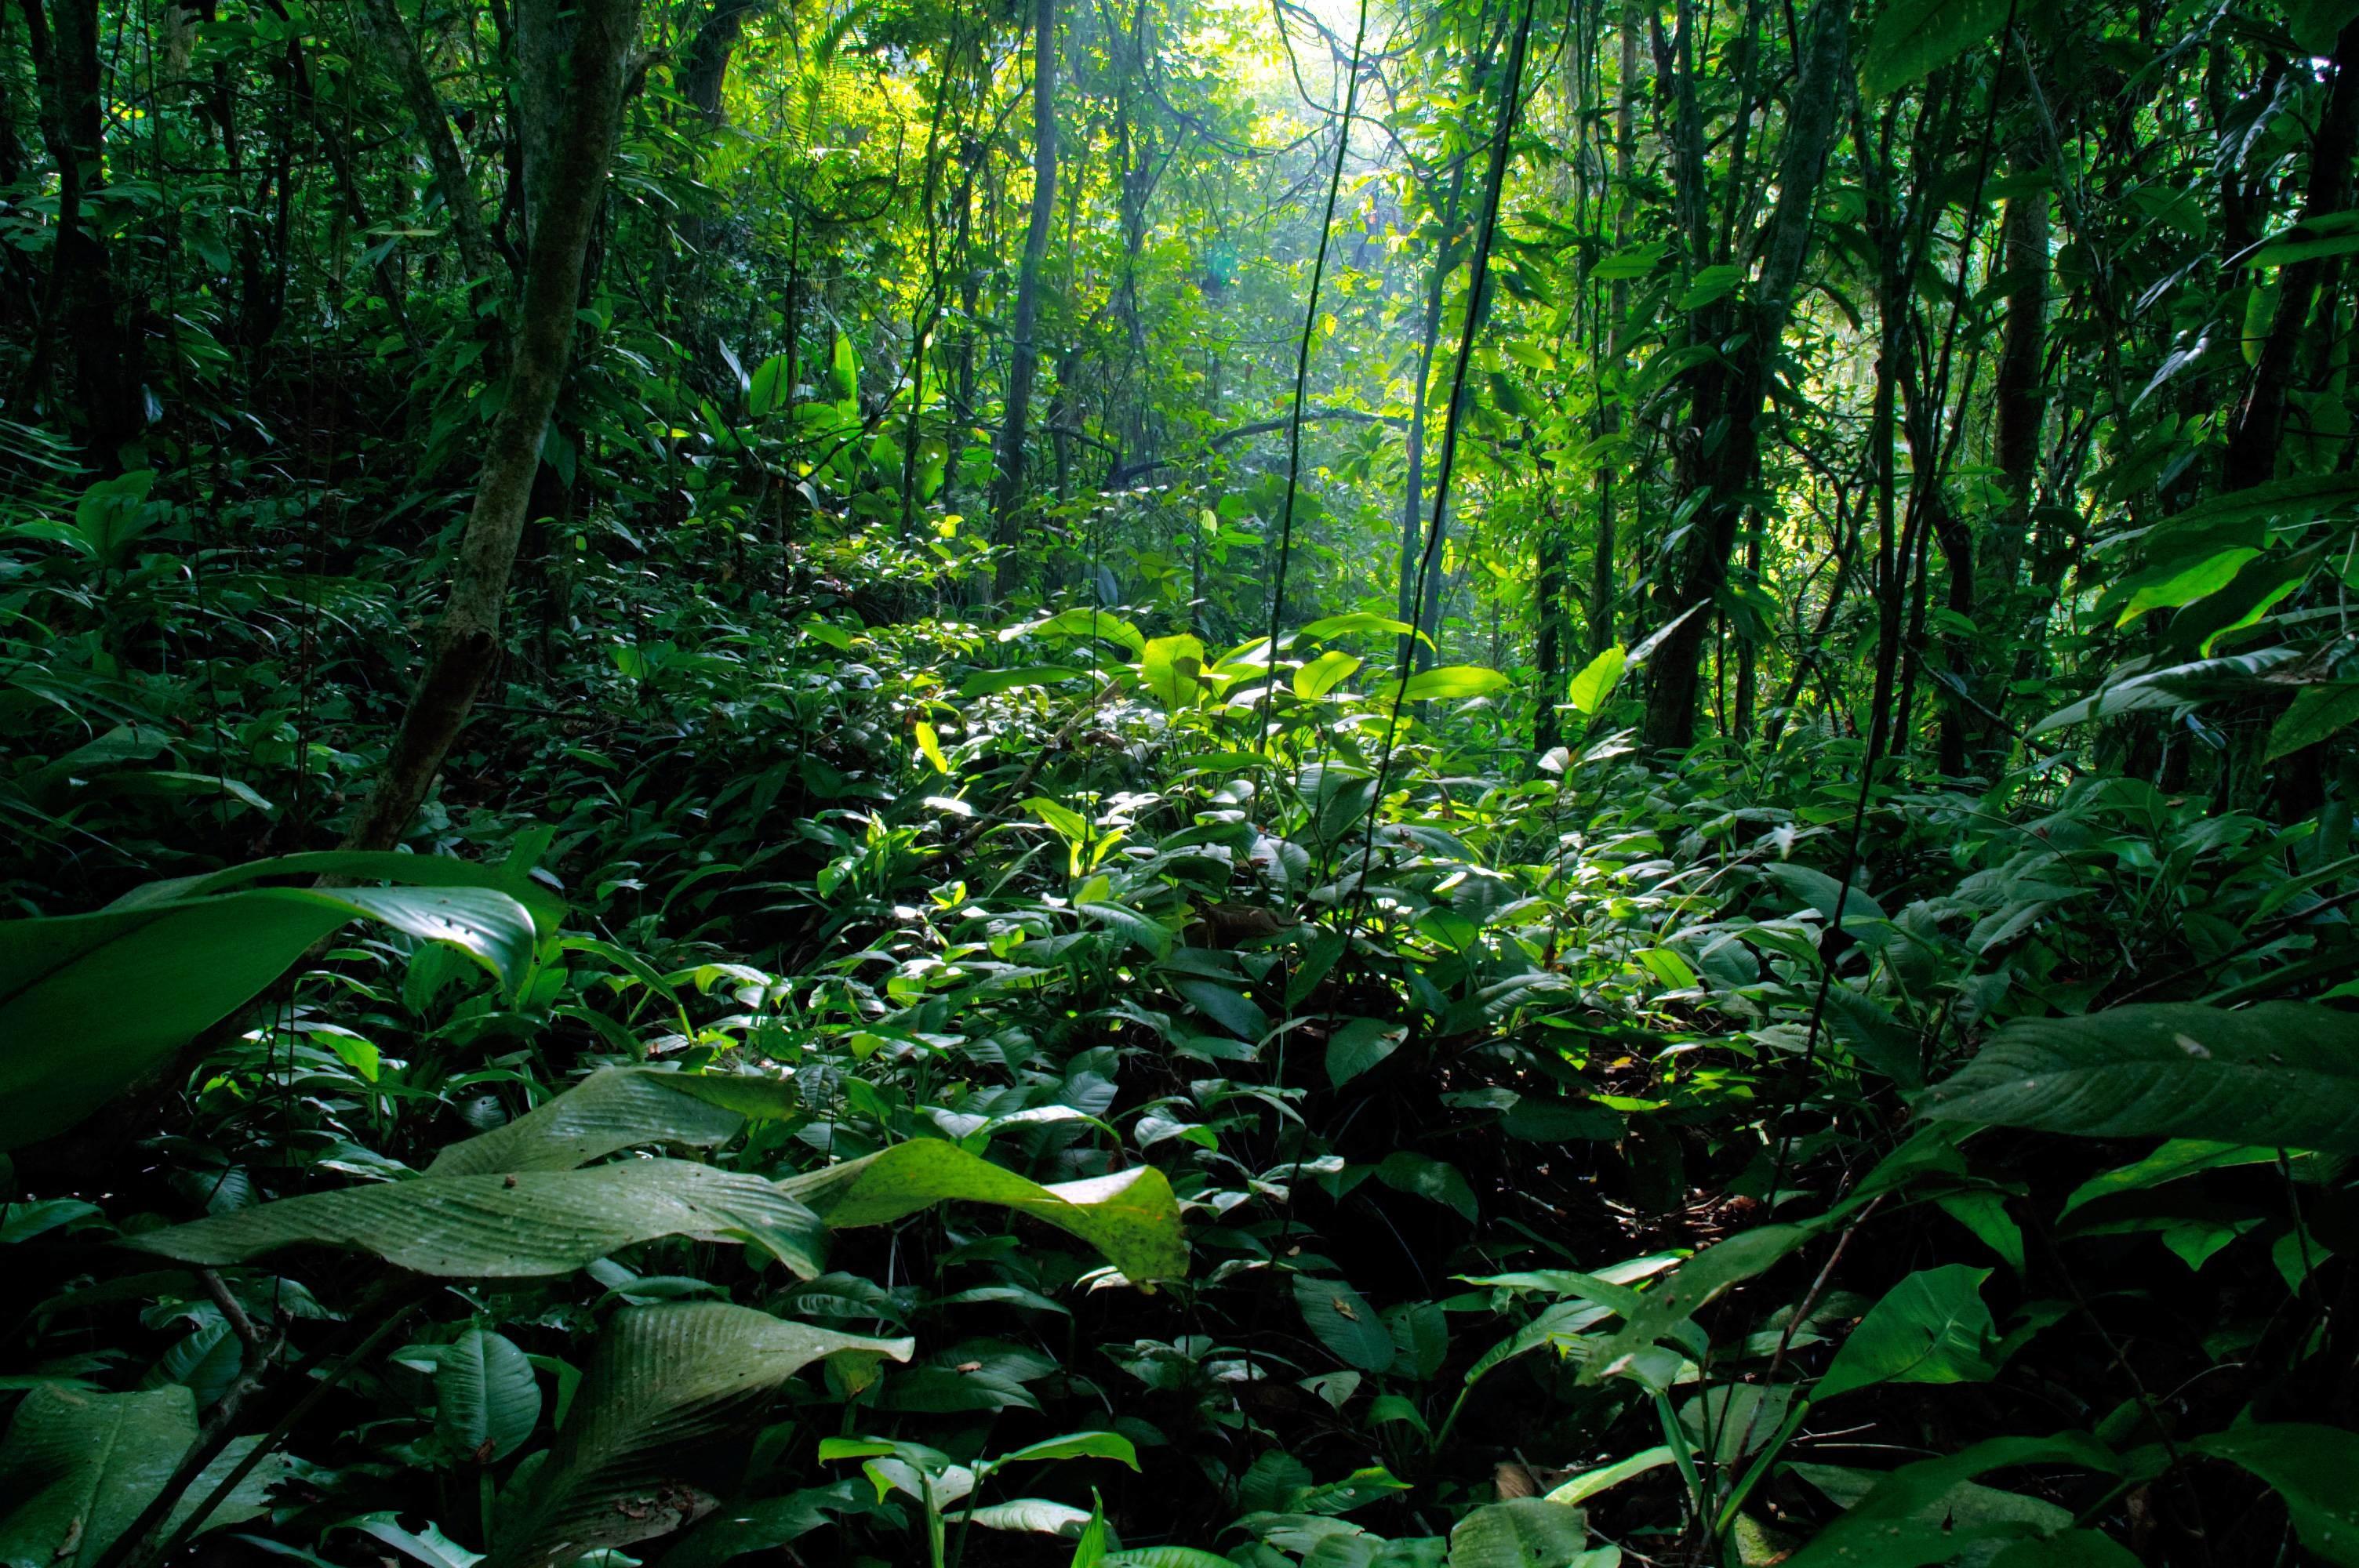 Rainforest Backgrounds (60+ images)